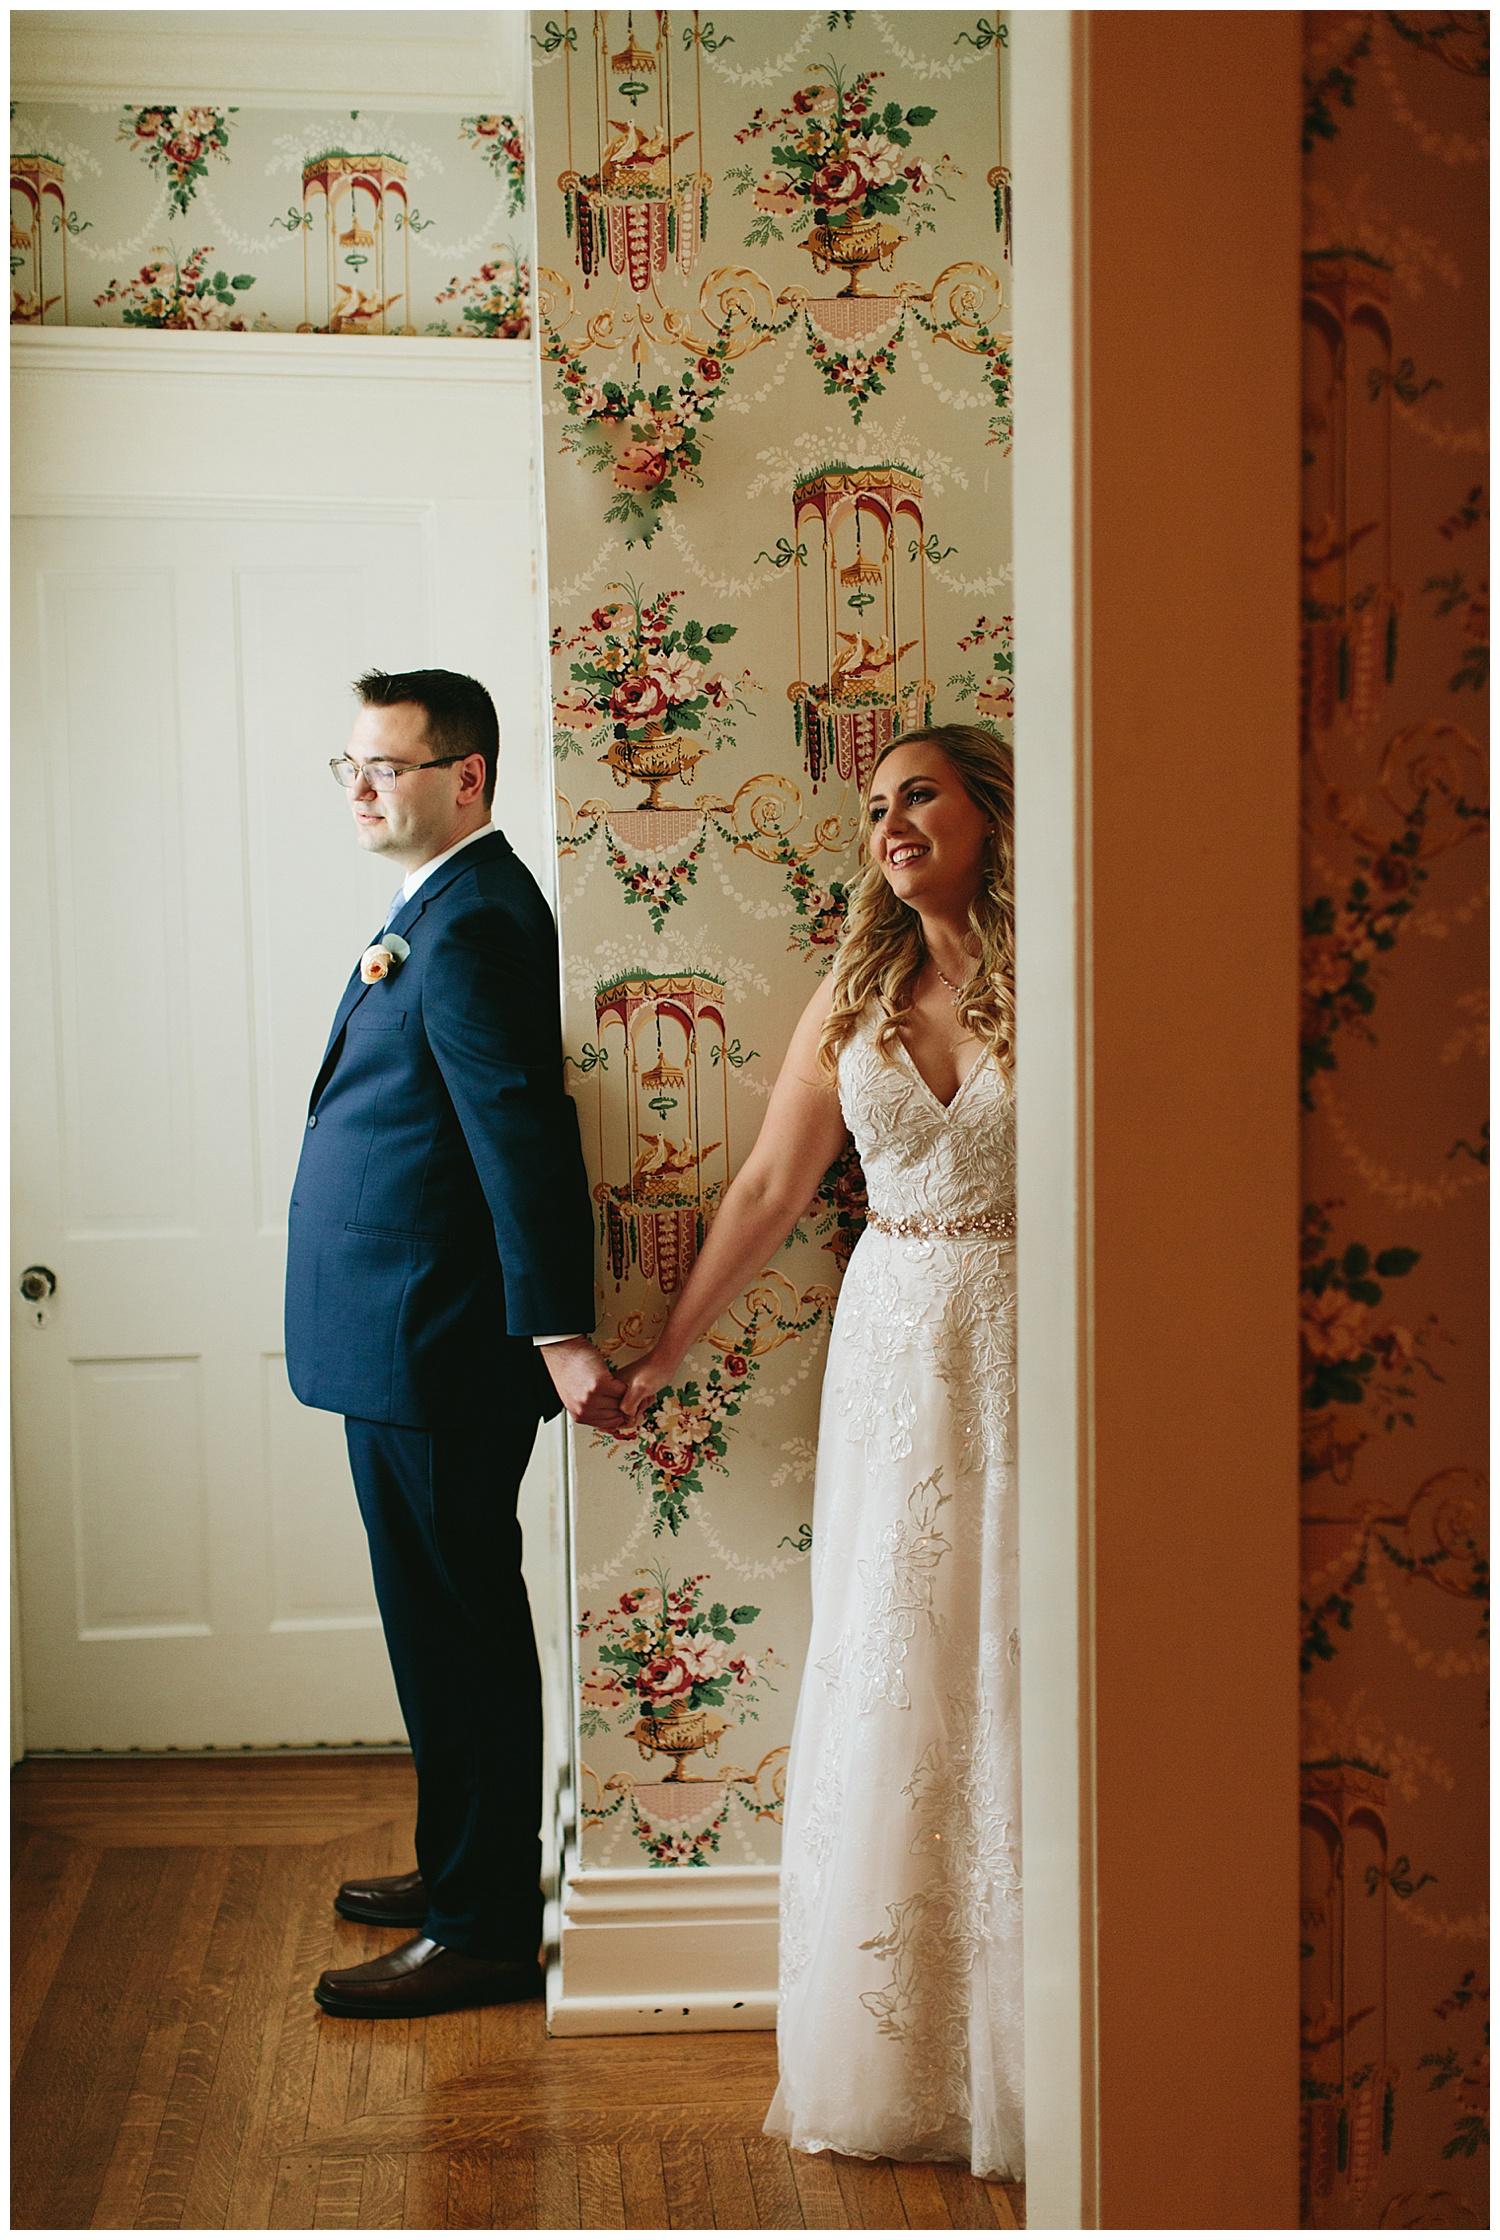 trent.and.kendra.photography.whitehall.wedding-41.jpg